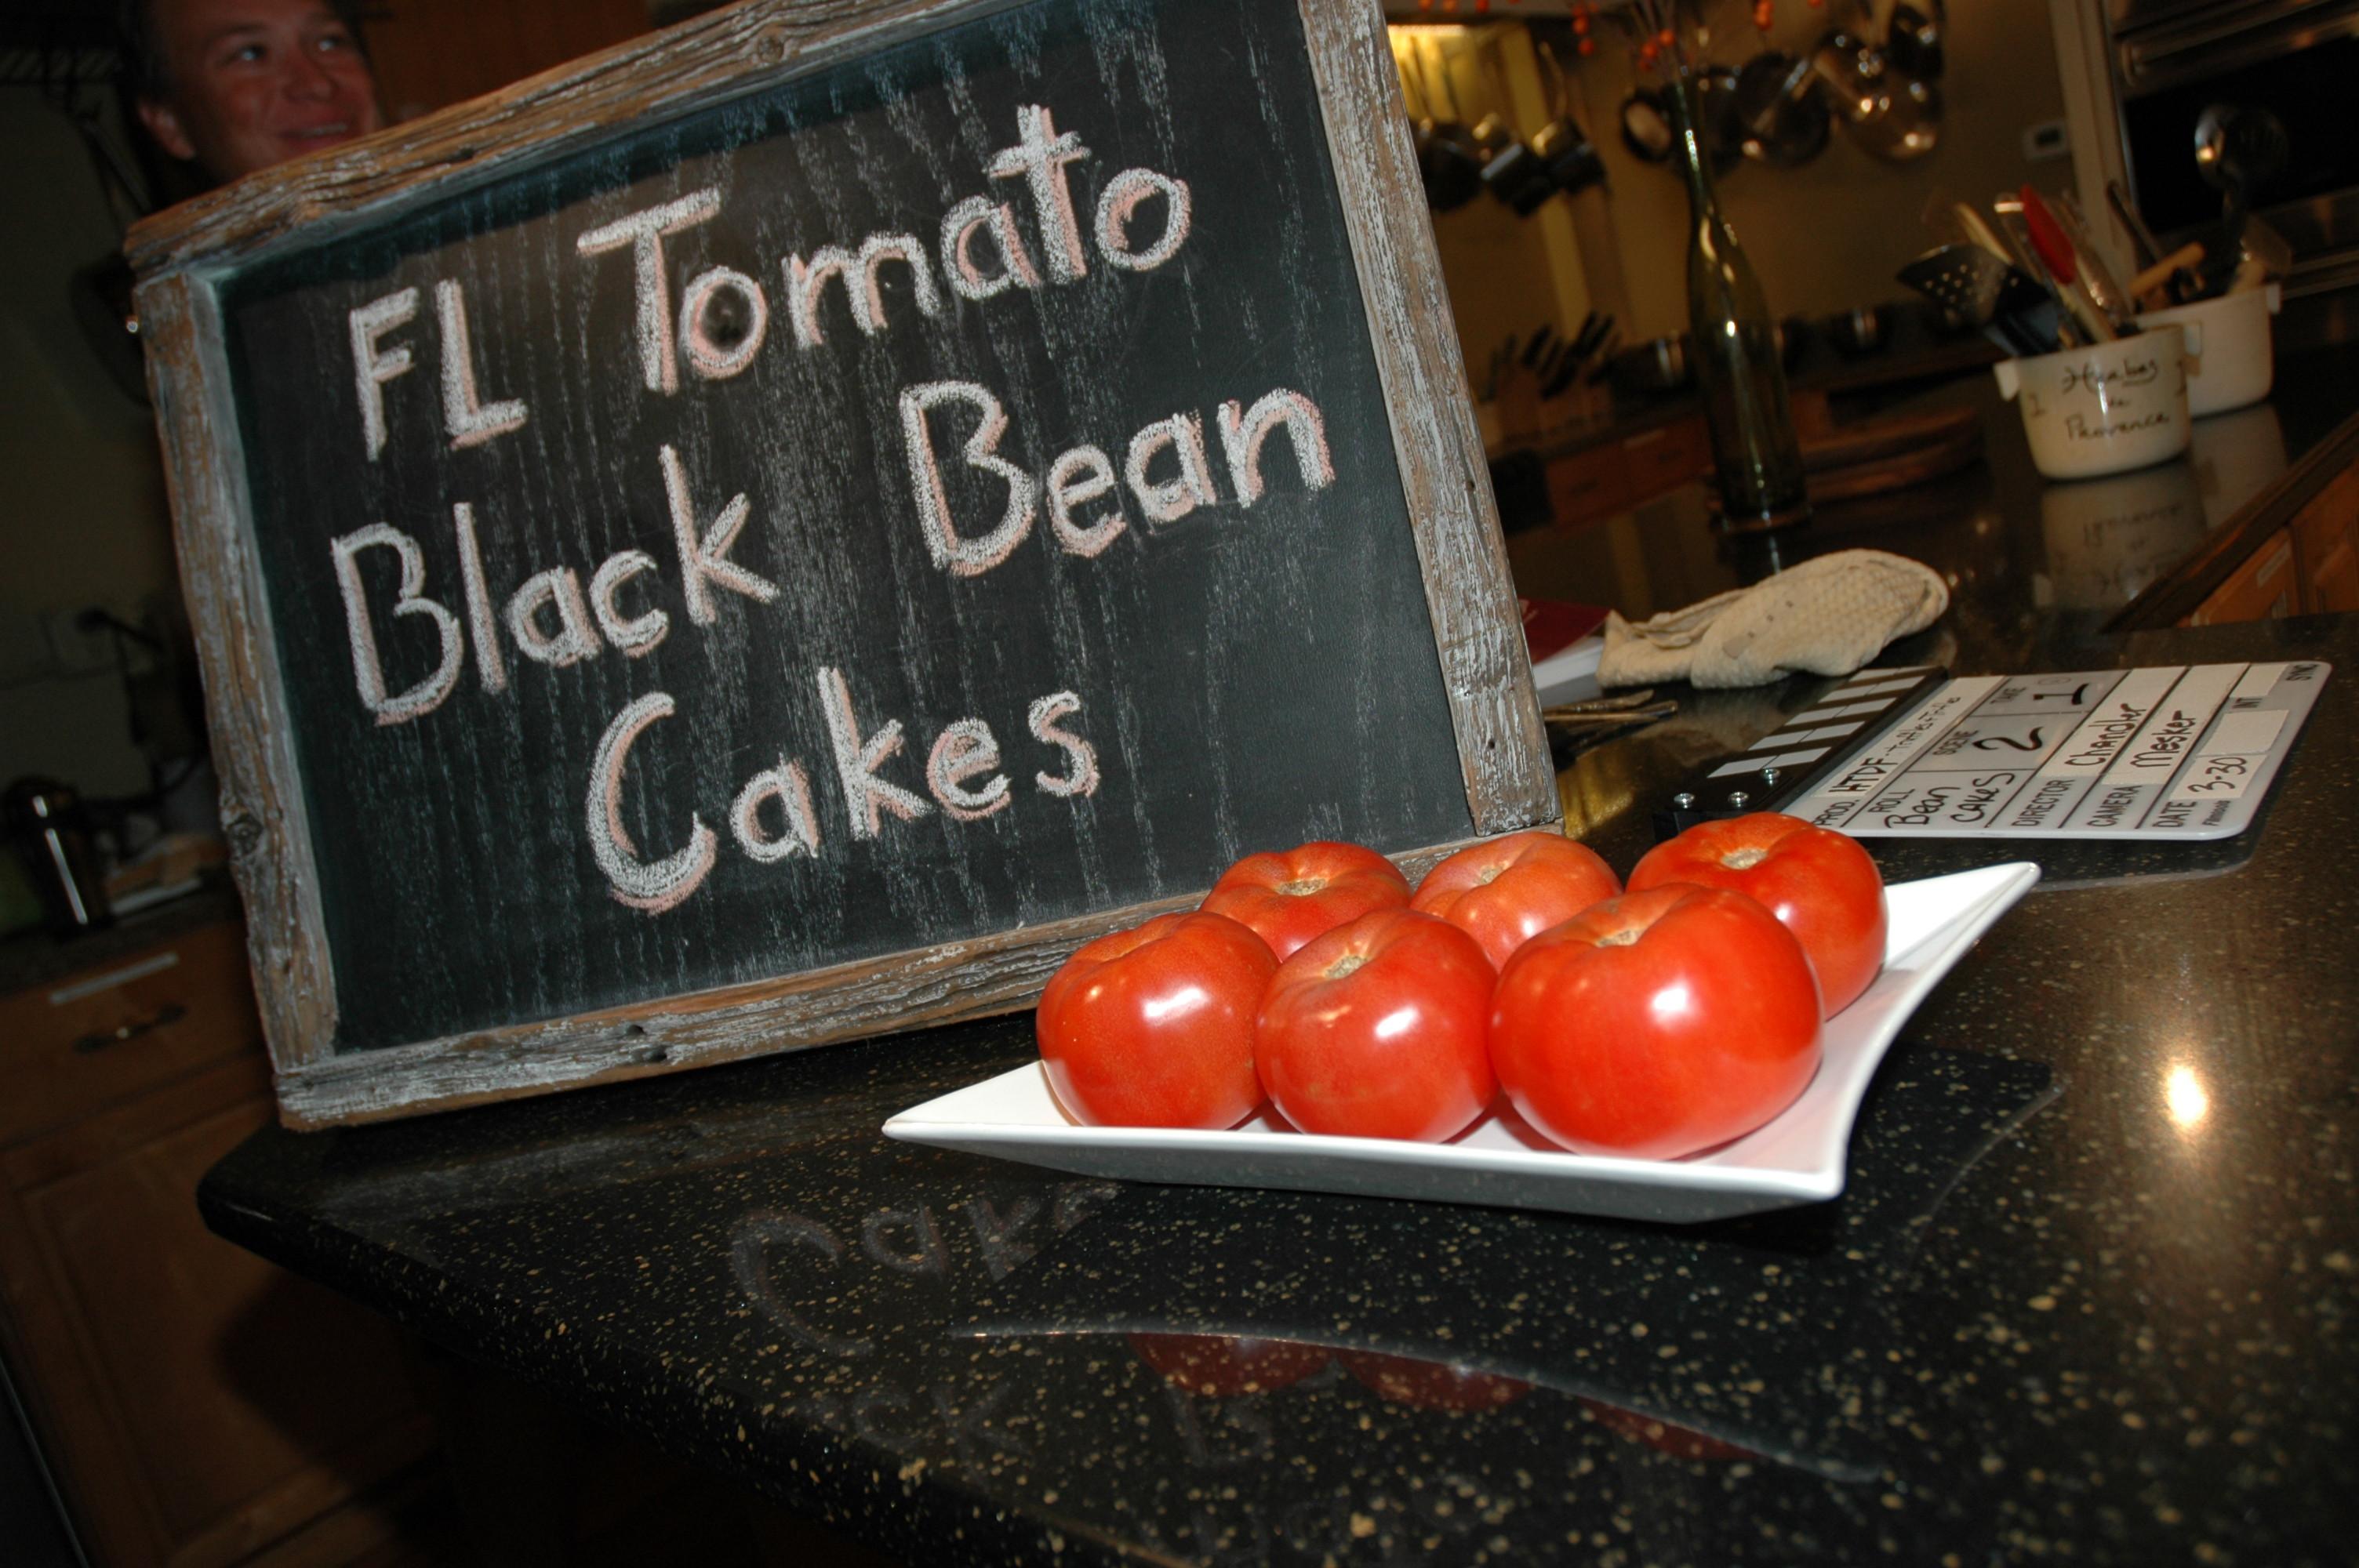 Florida Food Service Regulations